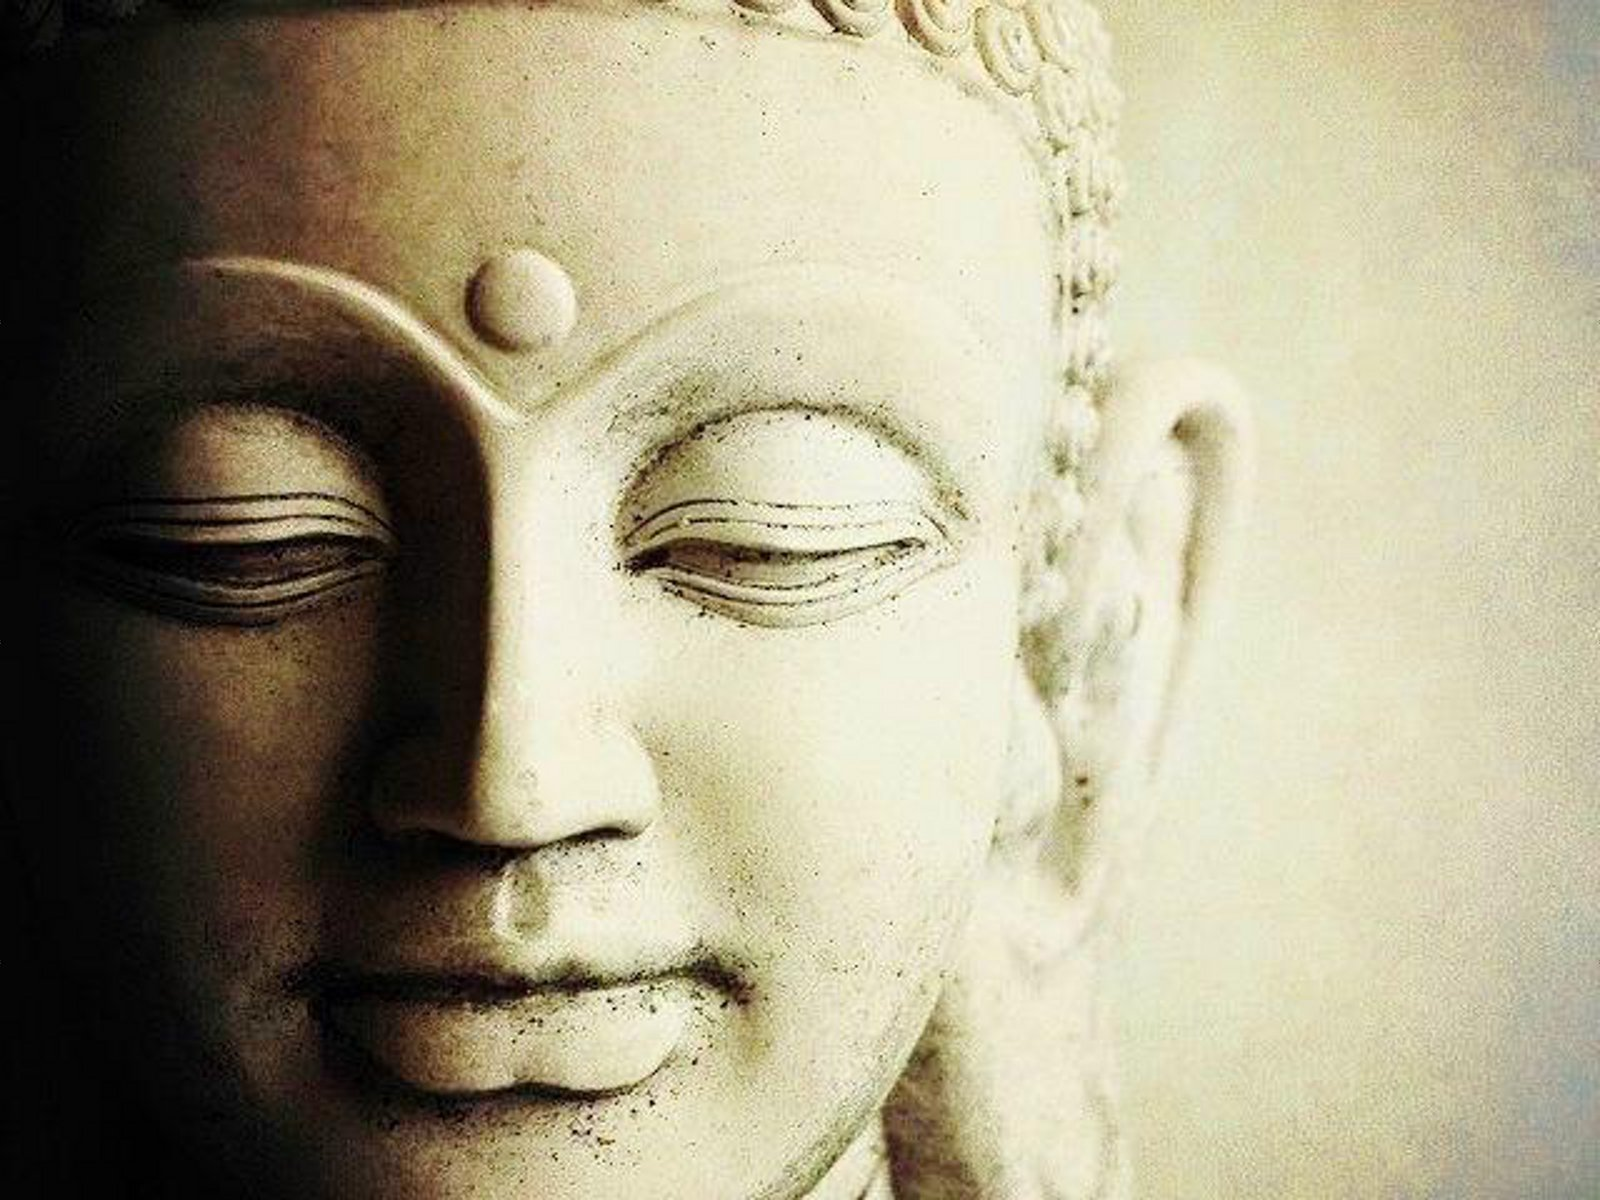 https://i2.wp.com/eskipaper.com/images/buddha-7.jpg